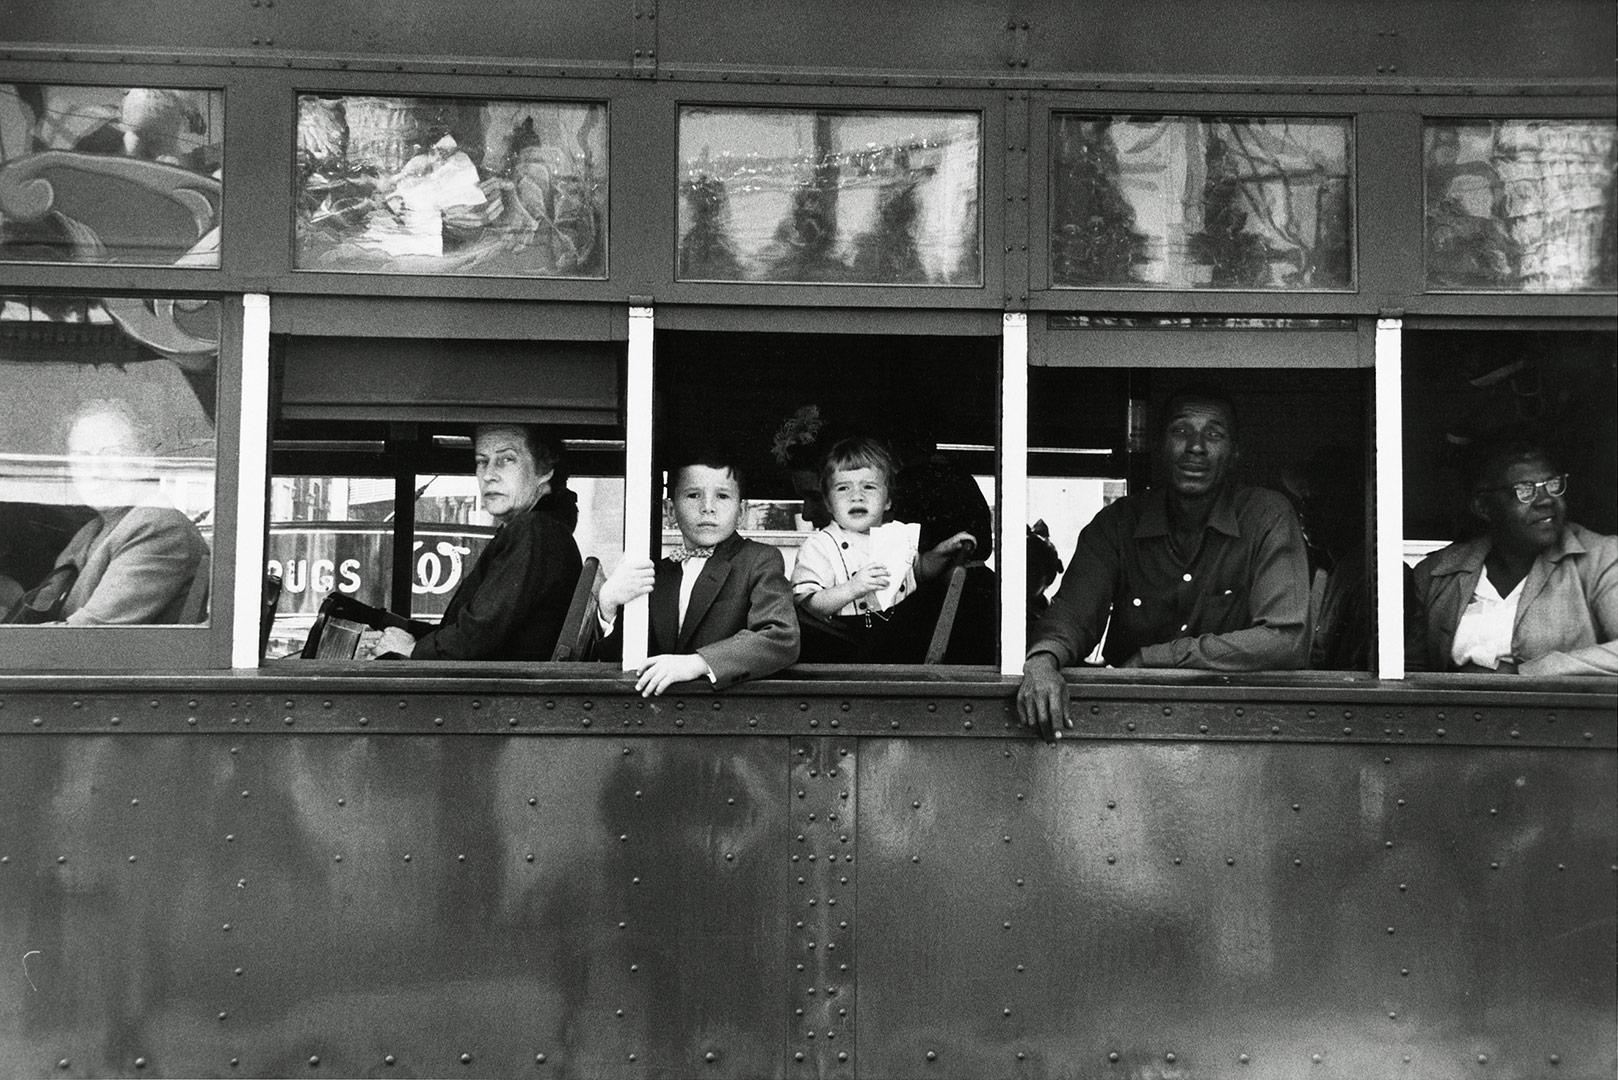 Trolley—New Orleans - Robert Frank (1955)